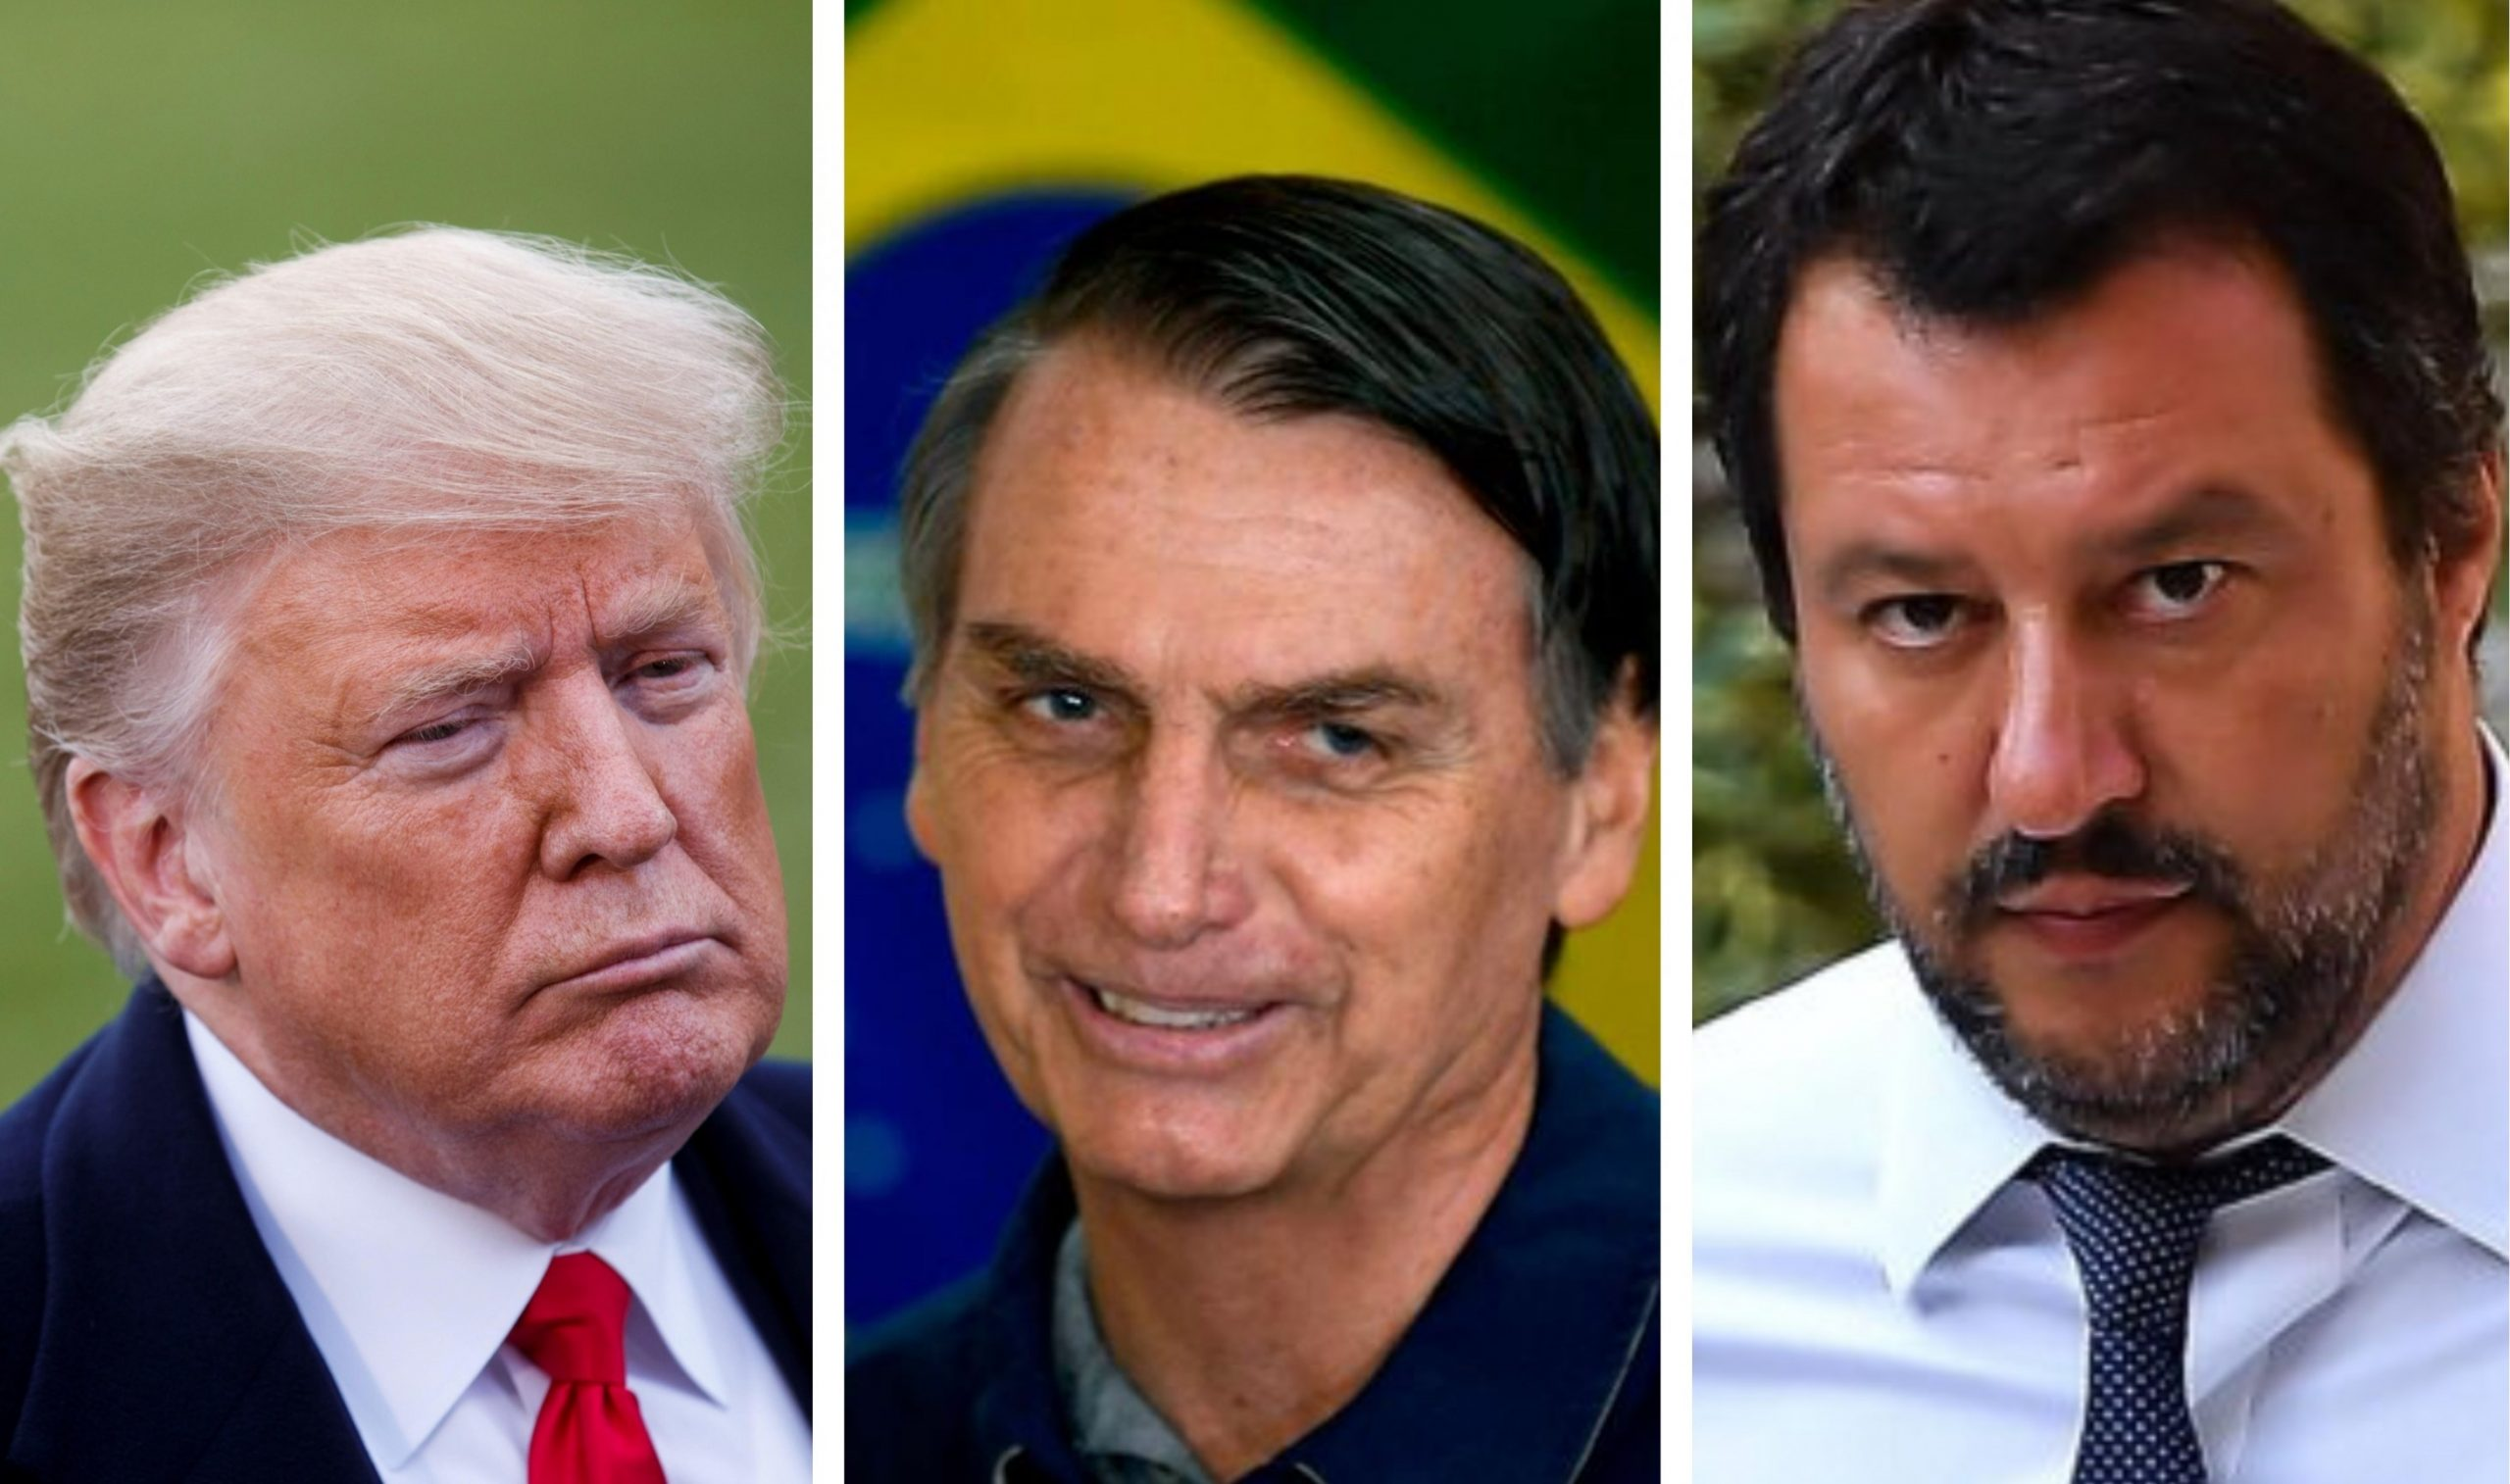 Populismo y glosolalia – Otras miradas